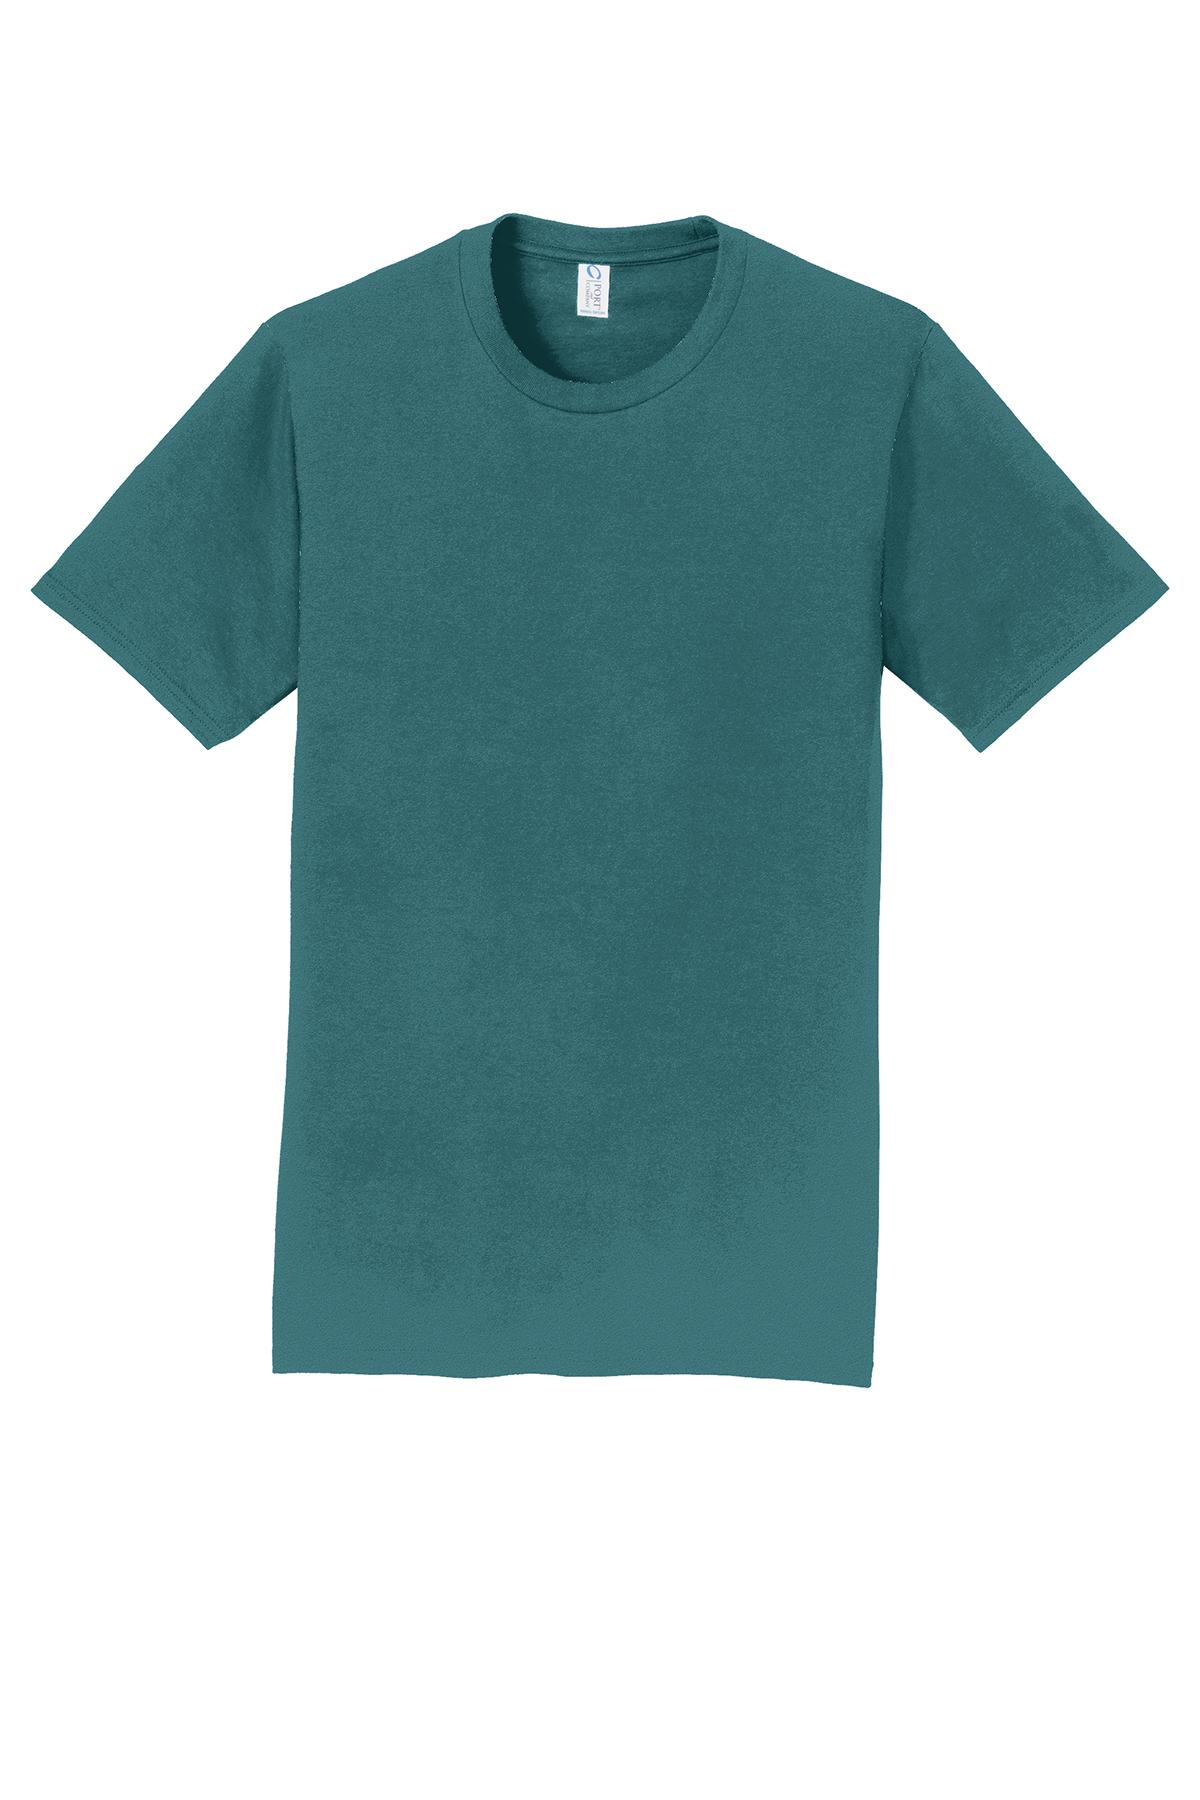 port company fan favorite tee 100 cotton t shirts. Black Bedroom Furniture Sets. Home Design Ideas